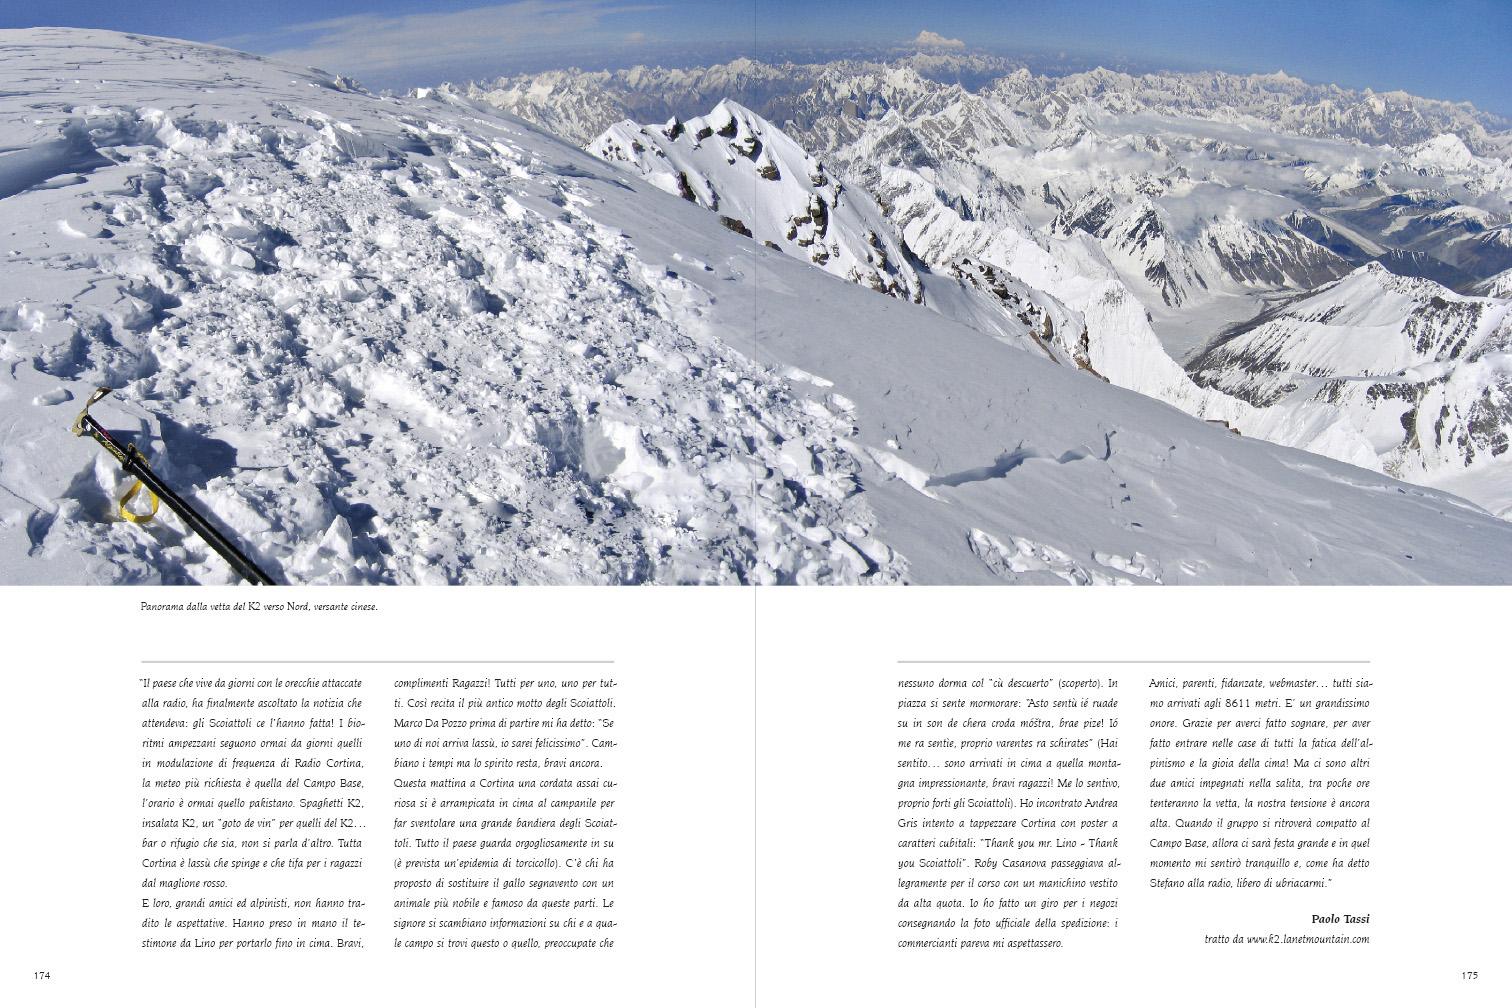 K2 EXPEDITION 1954-2004 Giuseppe Ghedina Fotografo - 089.jpg